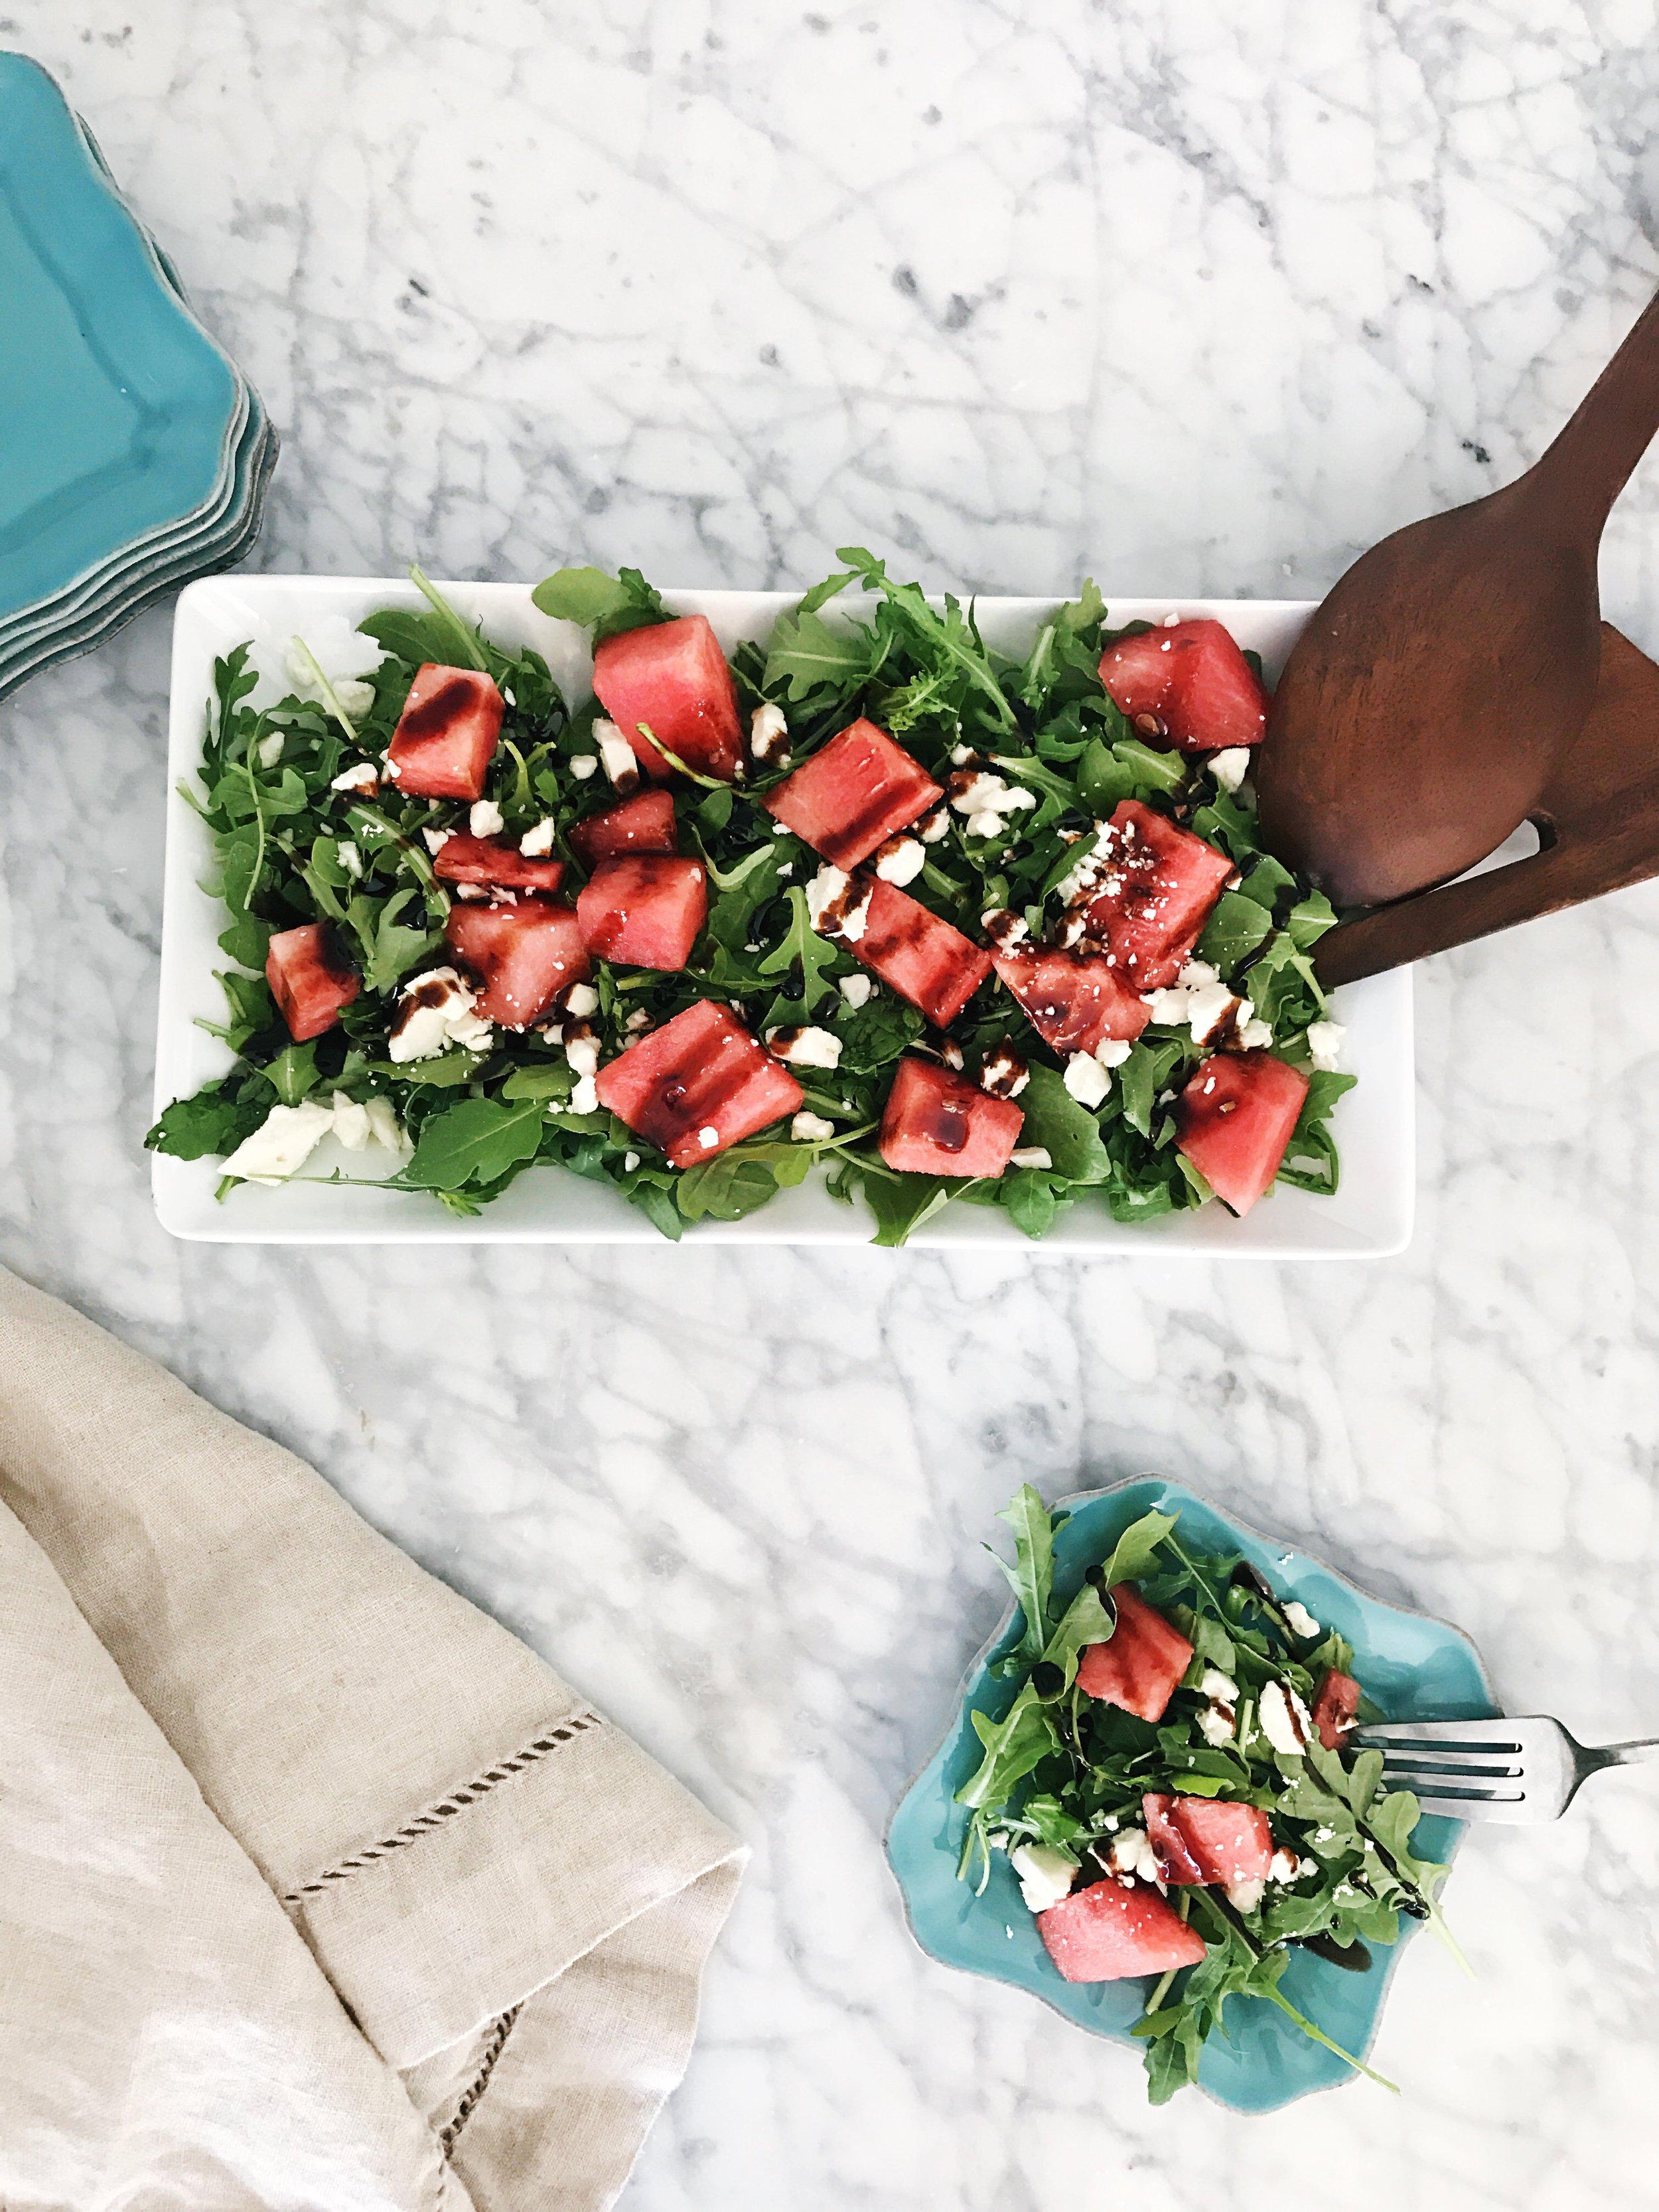 Watermelon, Feta & Arugula Salad - with a balsamic glaze